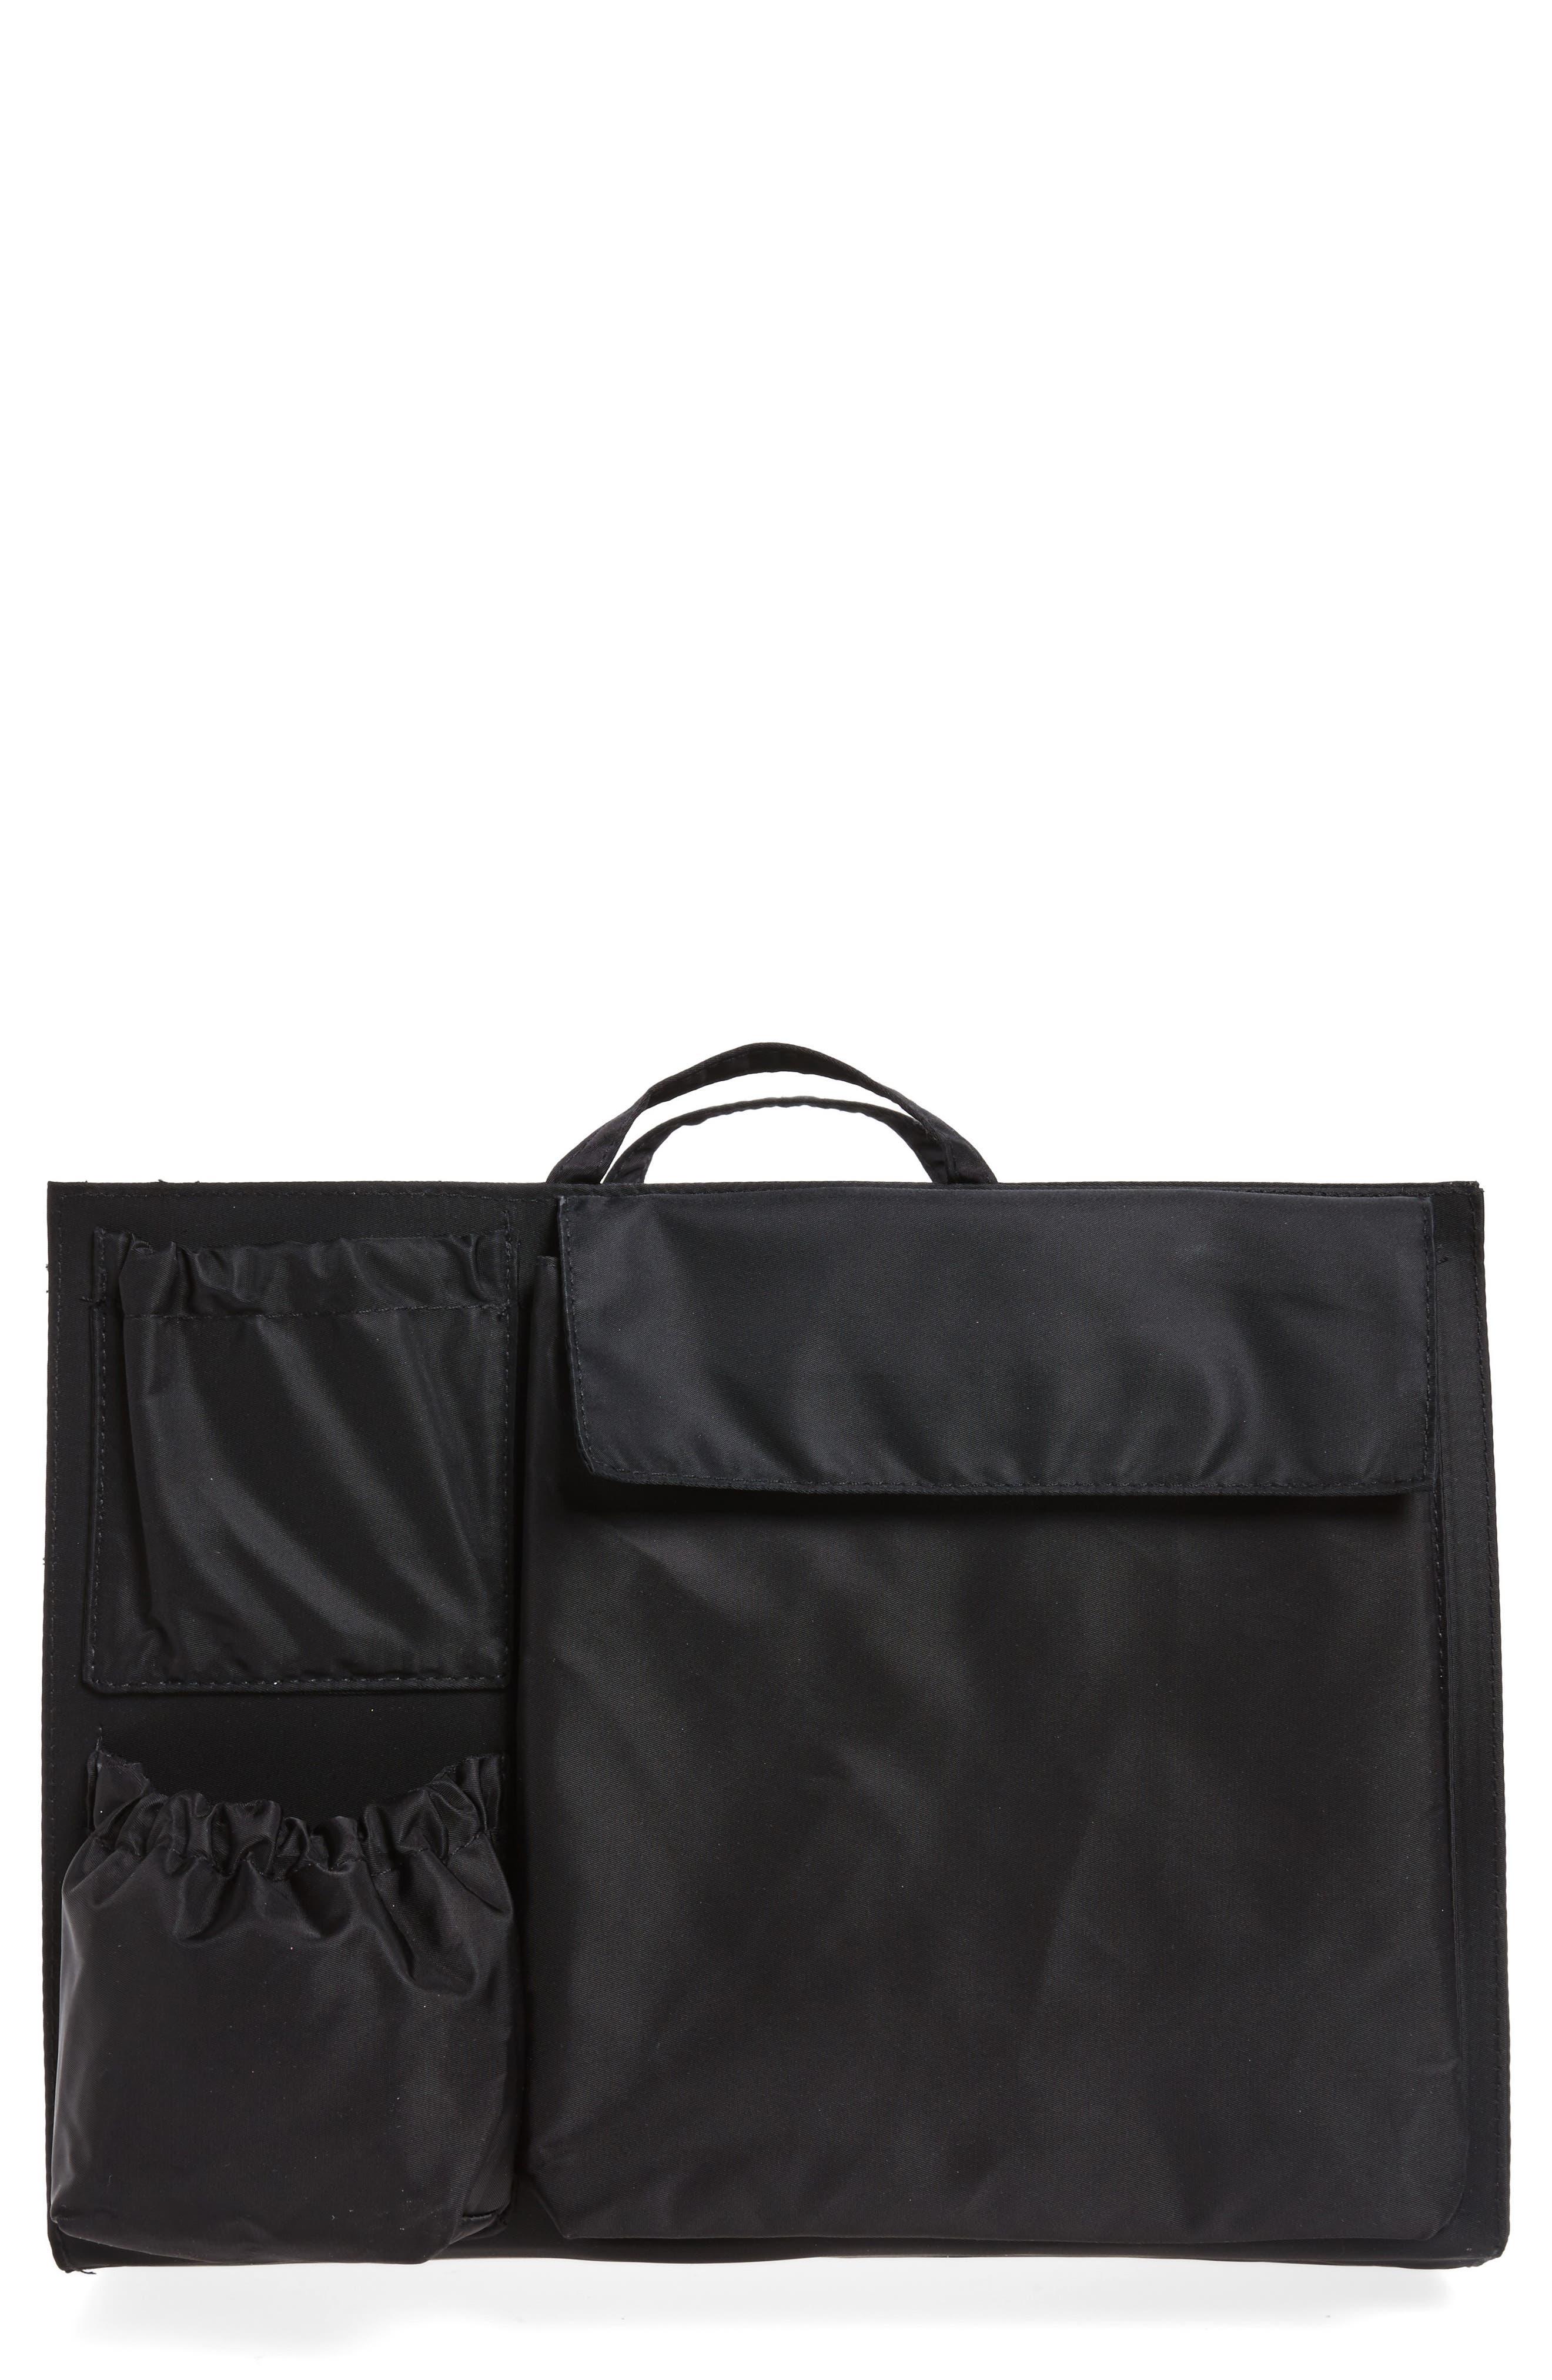 TOTESAVVY, Organization Handbag Insert, Main thumbnail 1, color, CLASSIC BLACK